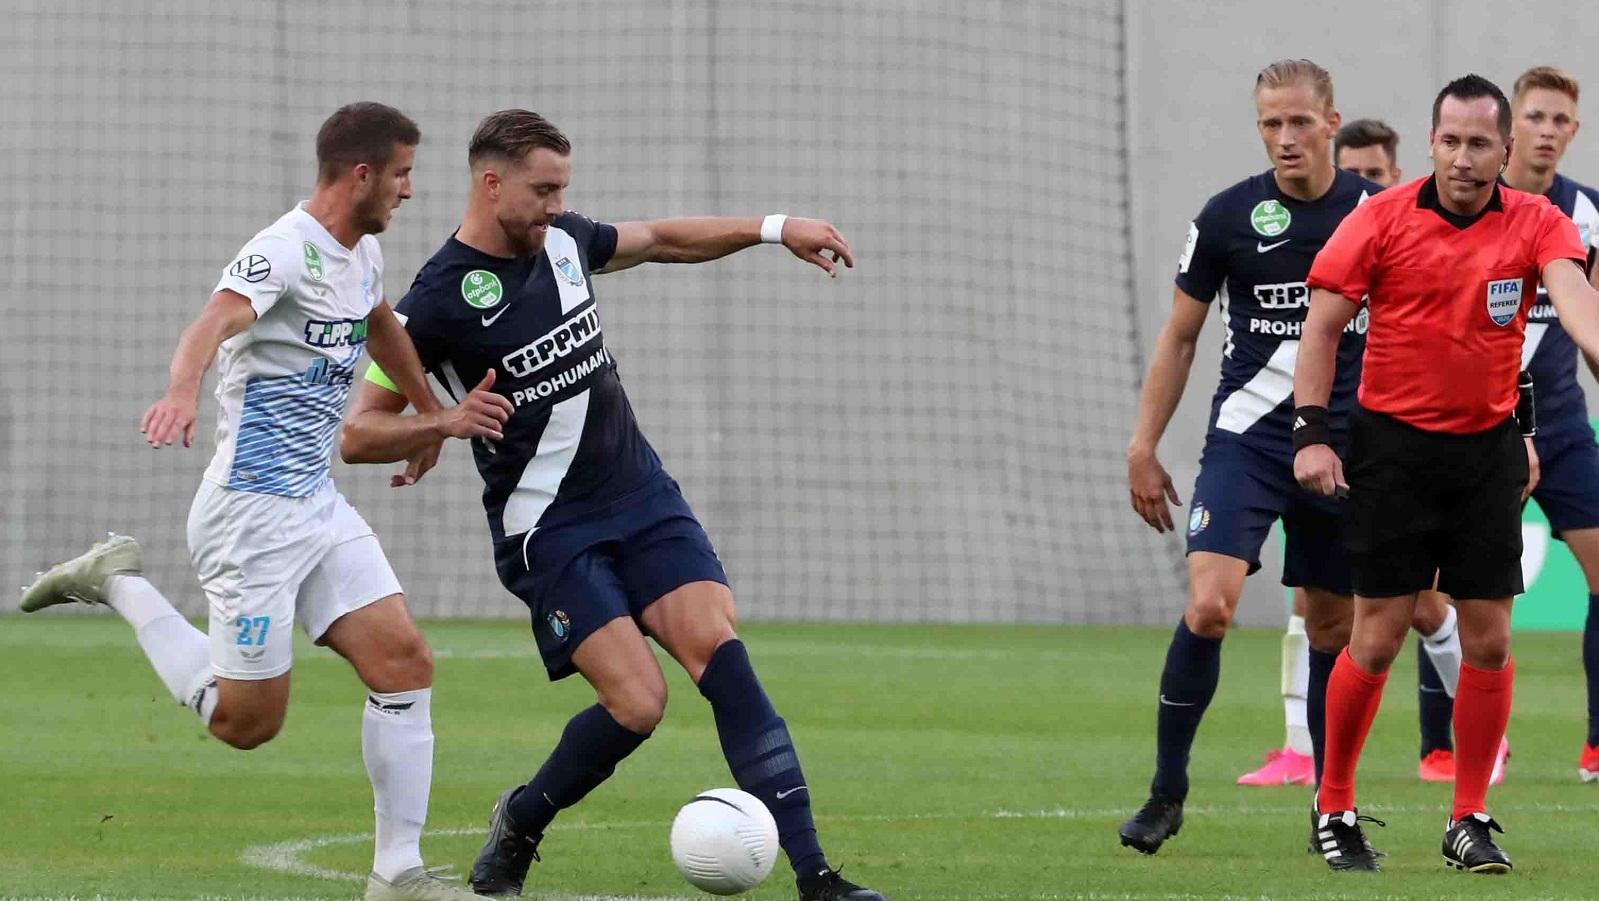 Képgaléria: MTK Budapest - ZTE FC 0-3 (0-1)